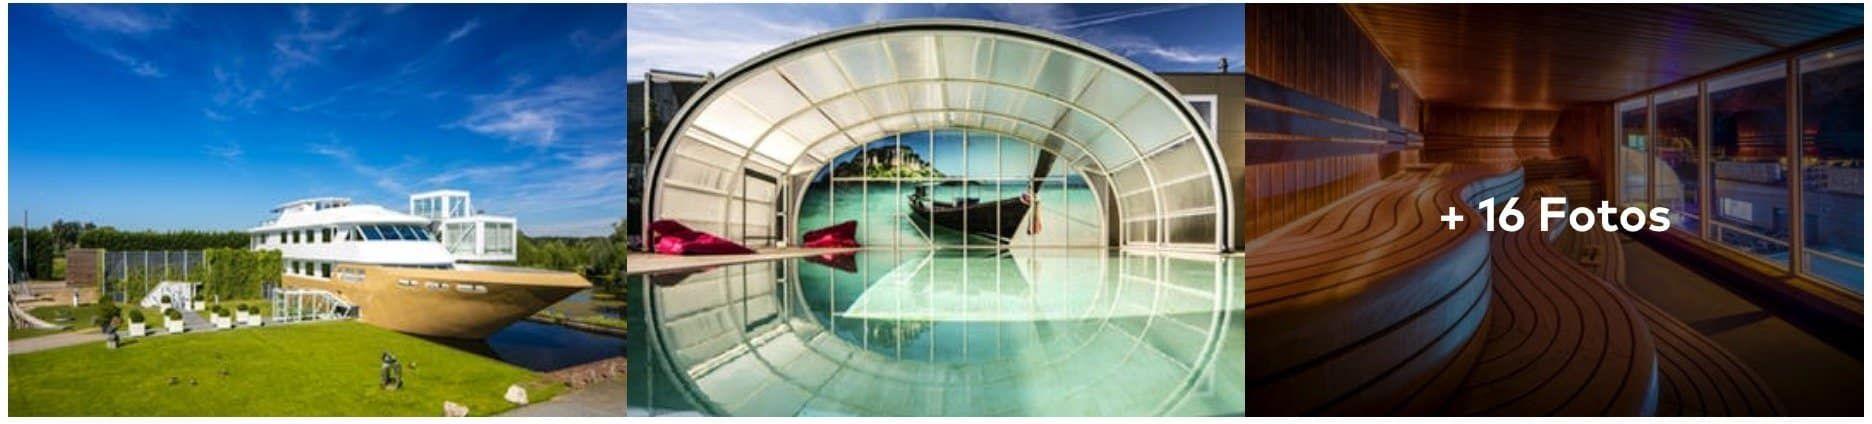 1 oder 2 Nächte Holland im top bewertetem 4*Hotel + Wellnessboot Zugang ab 49€ p.P.